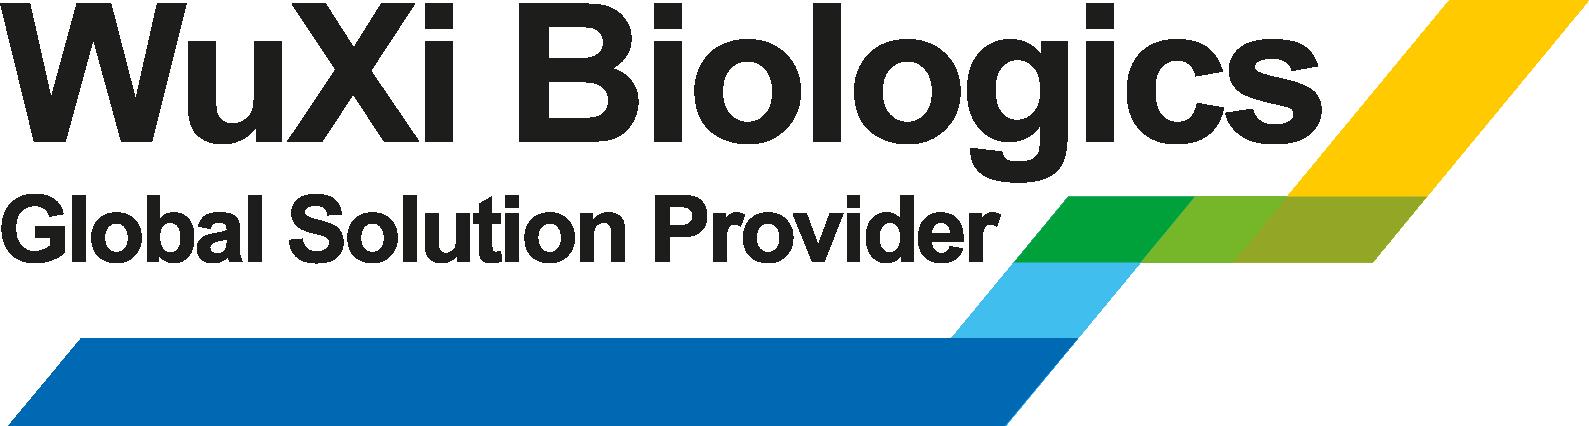 wuxi-biologics-logo.png